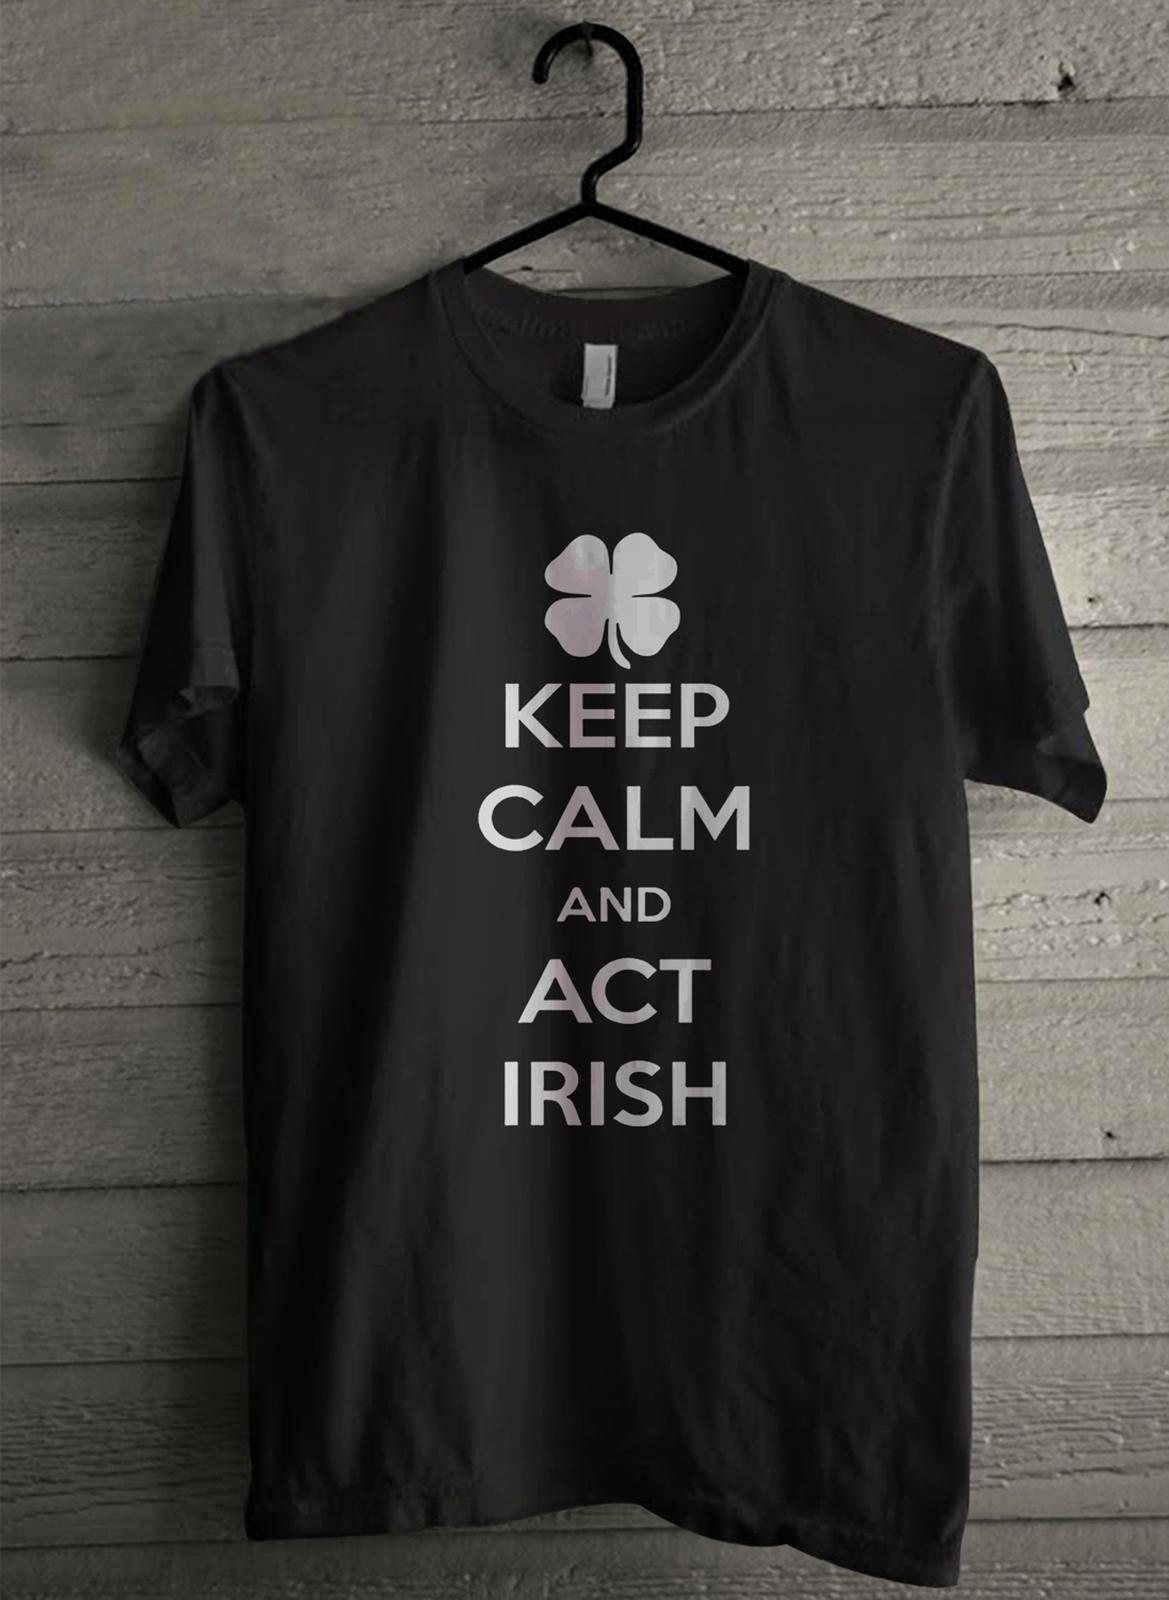 Keep calm and act irish